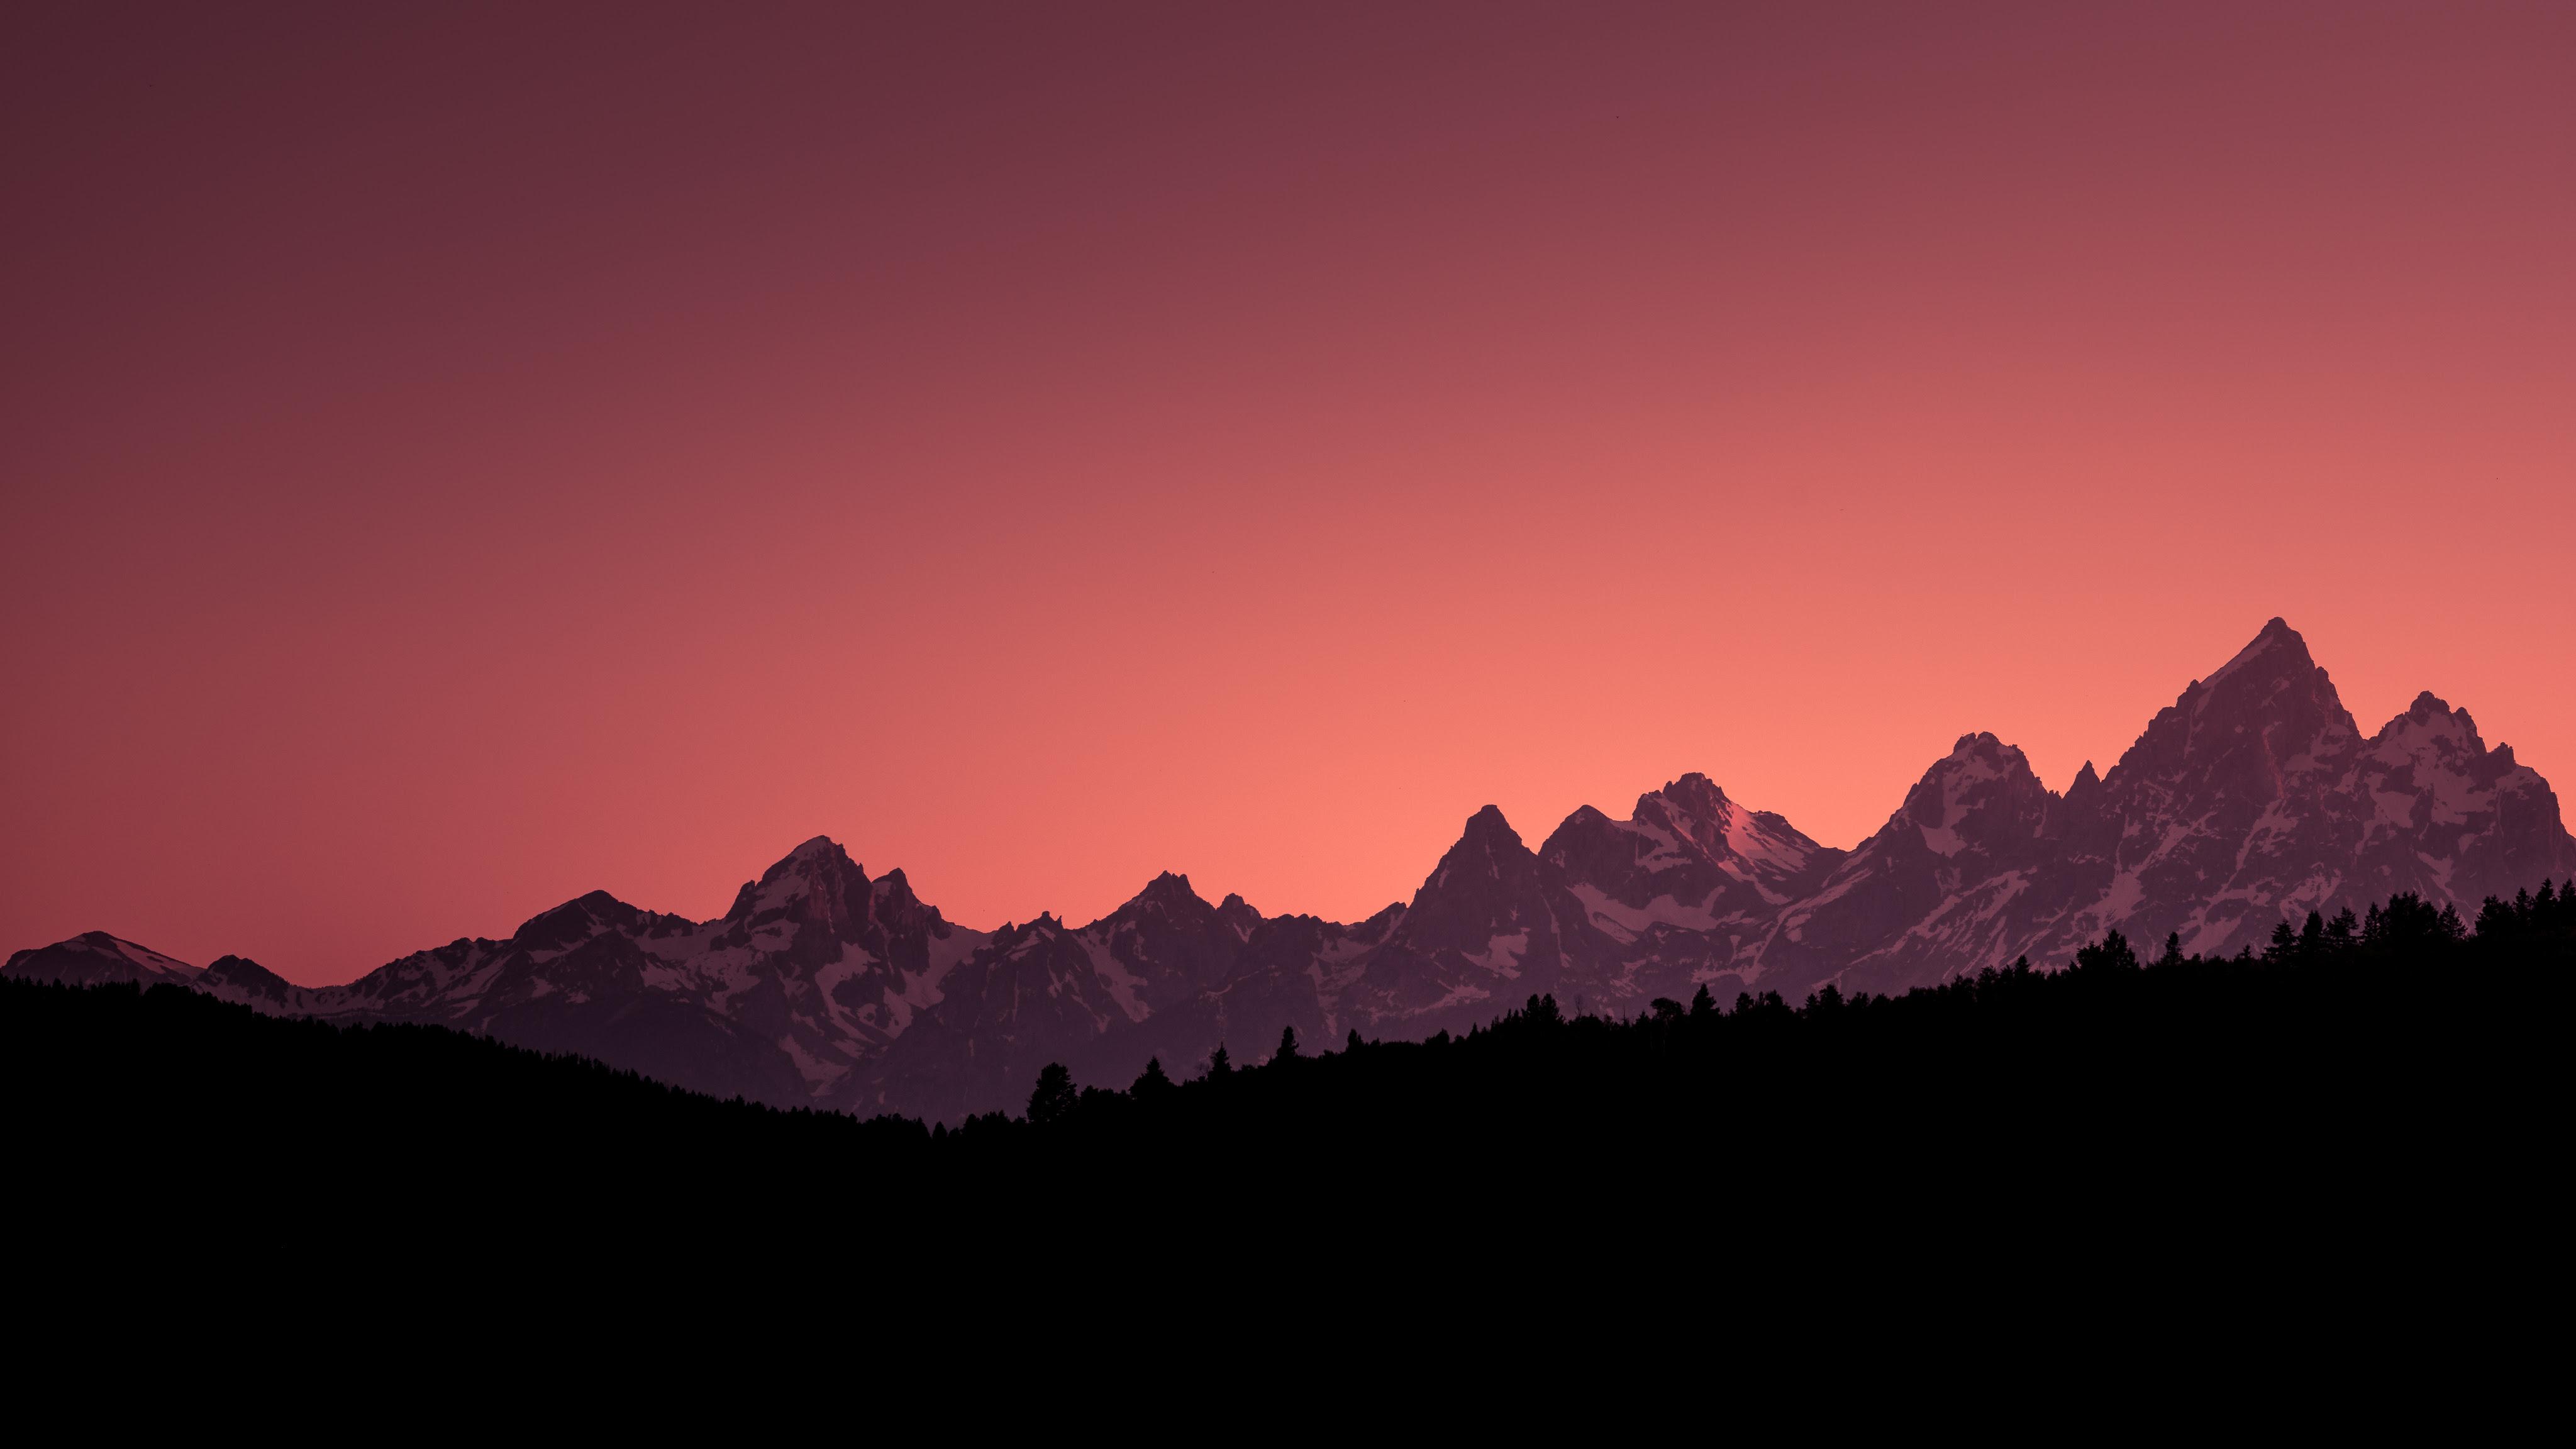 Grand Teton National Park Sunset 4k Wallpapers Hd Wallpapers